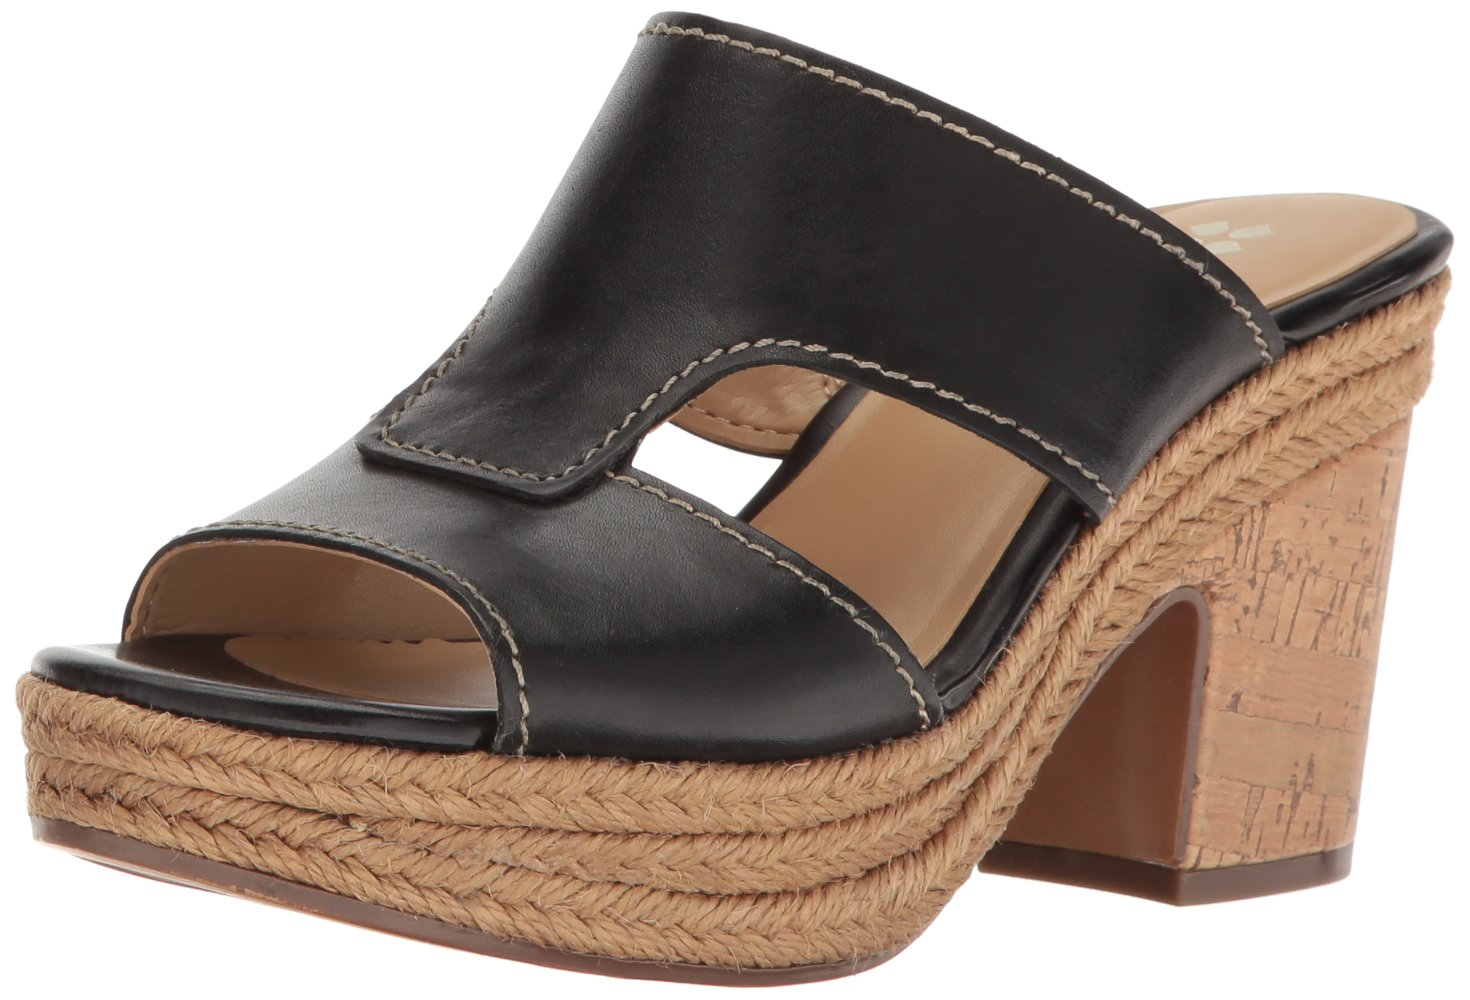 Naturalizer Women's Evette Platform Sandal B01L8MY74S 10.5 B(M) US Black